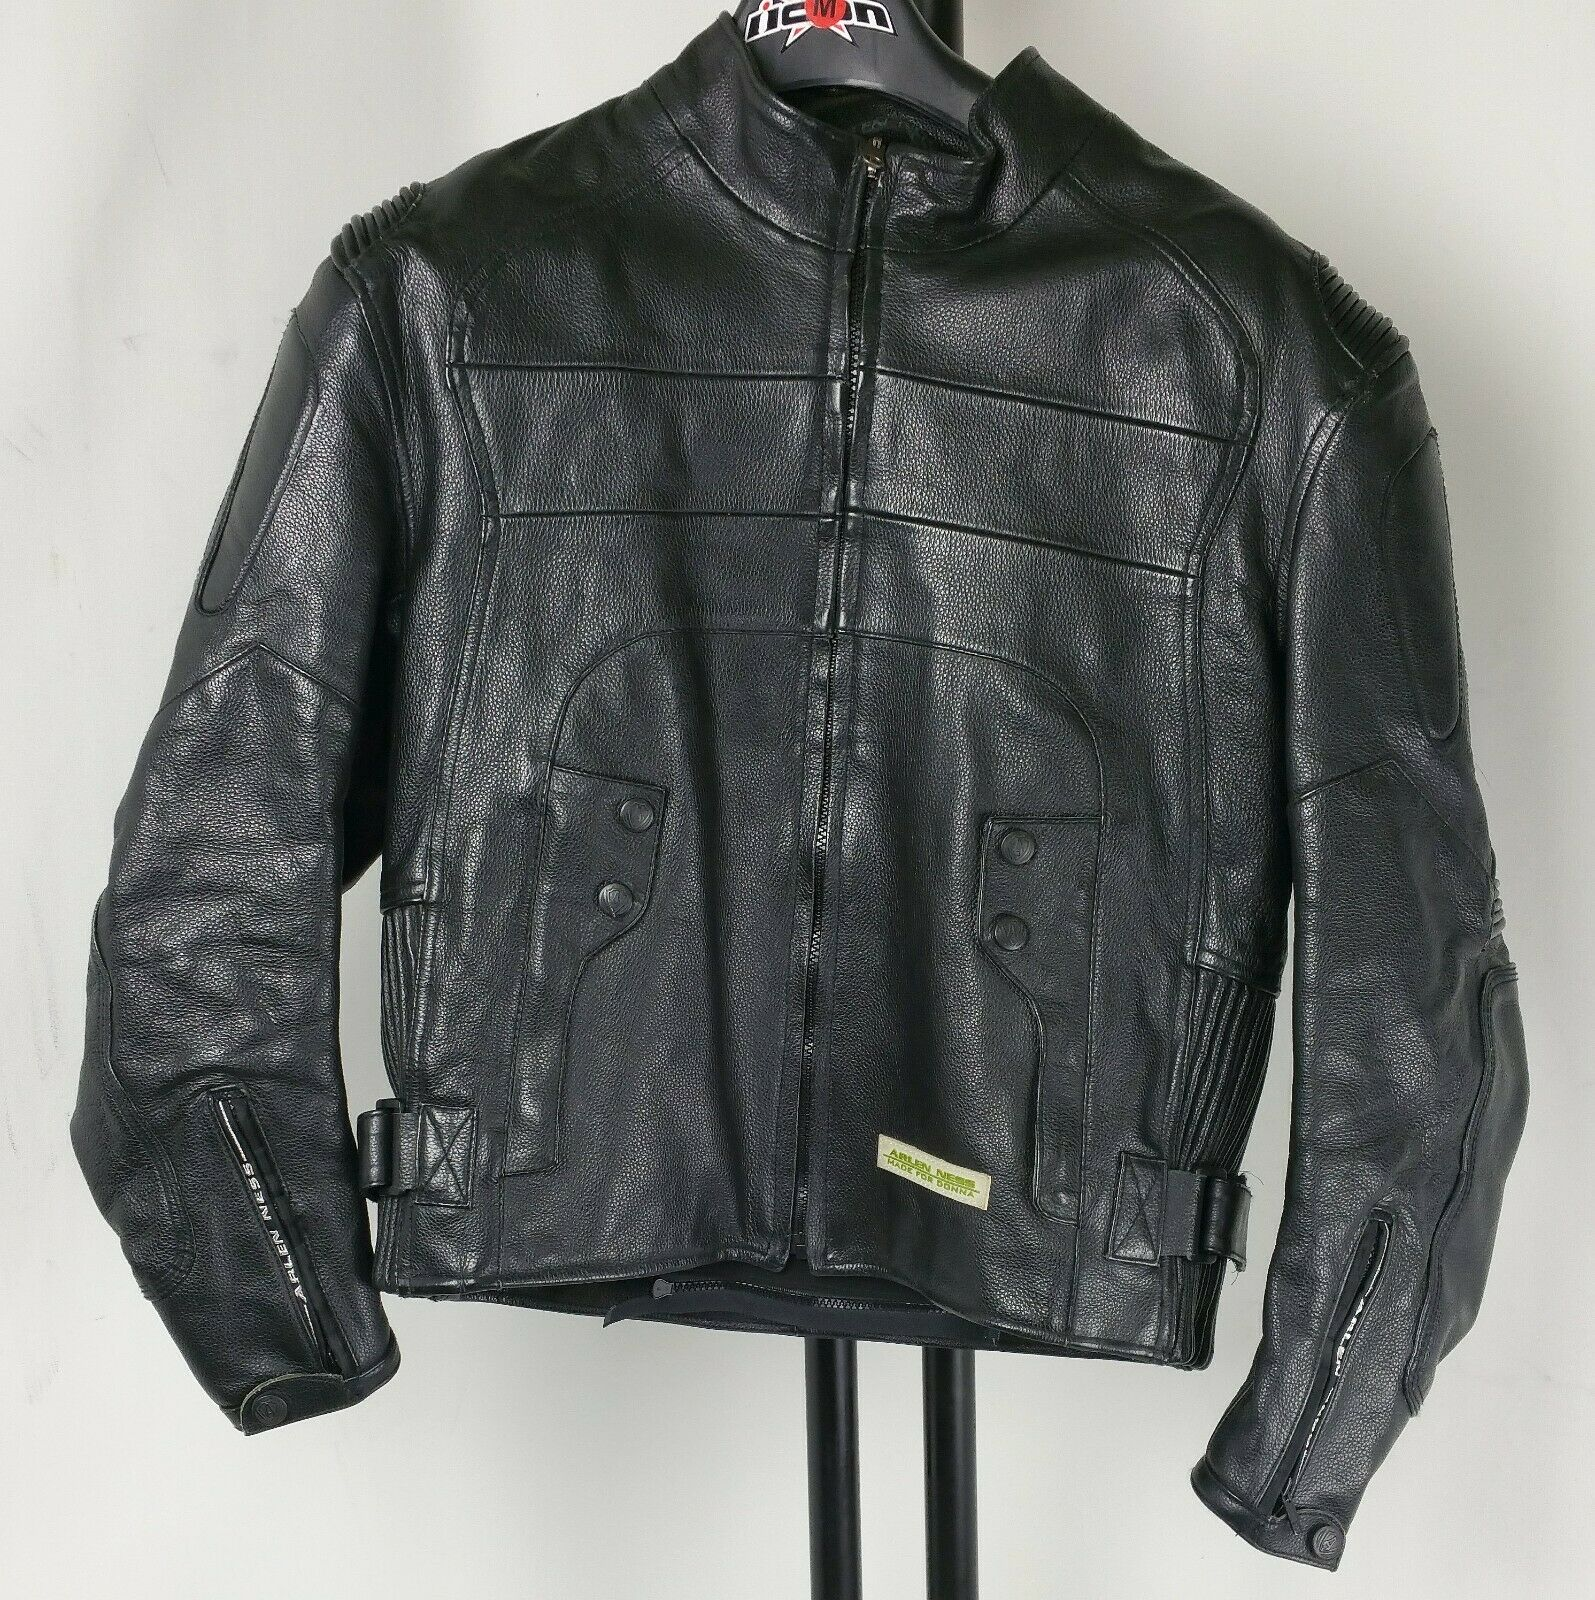 Arlen Ness Black Leather Motorcycle Riding Jacket